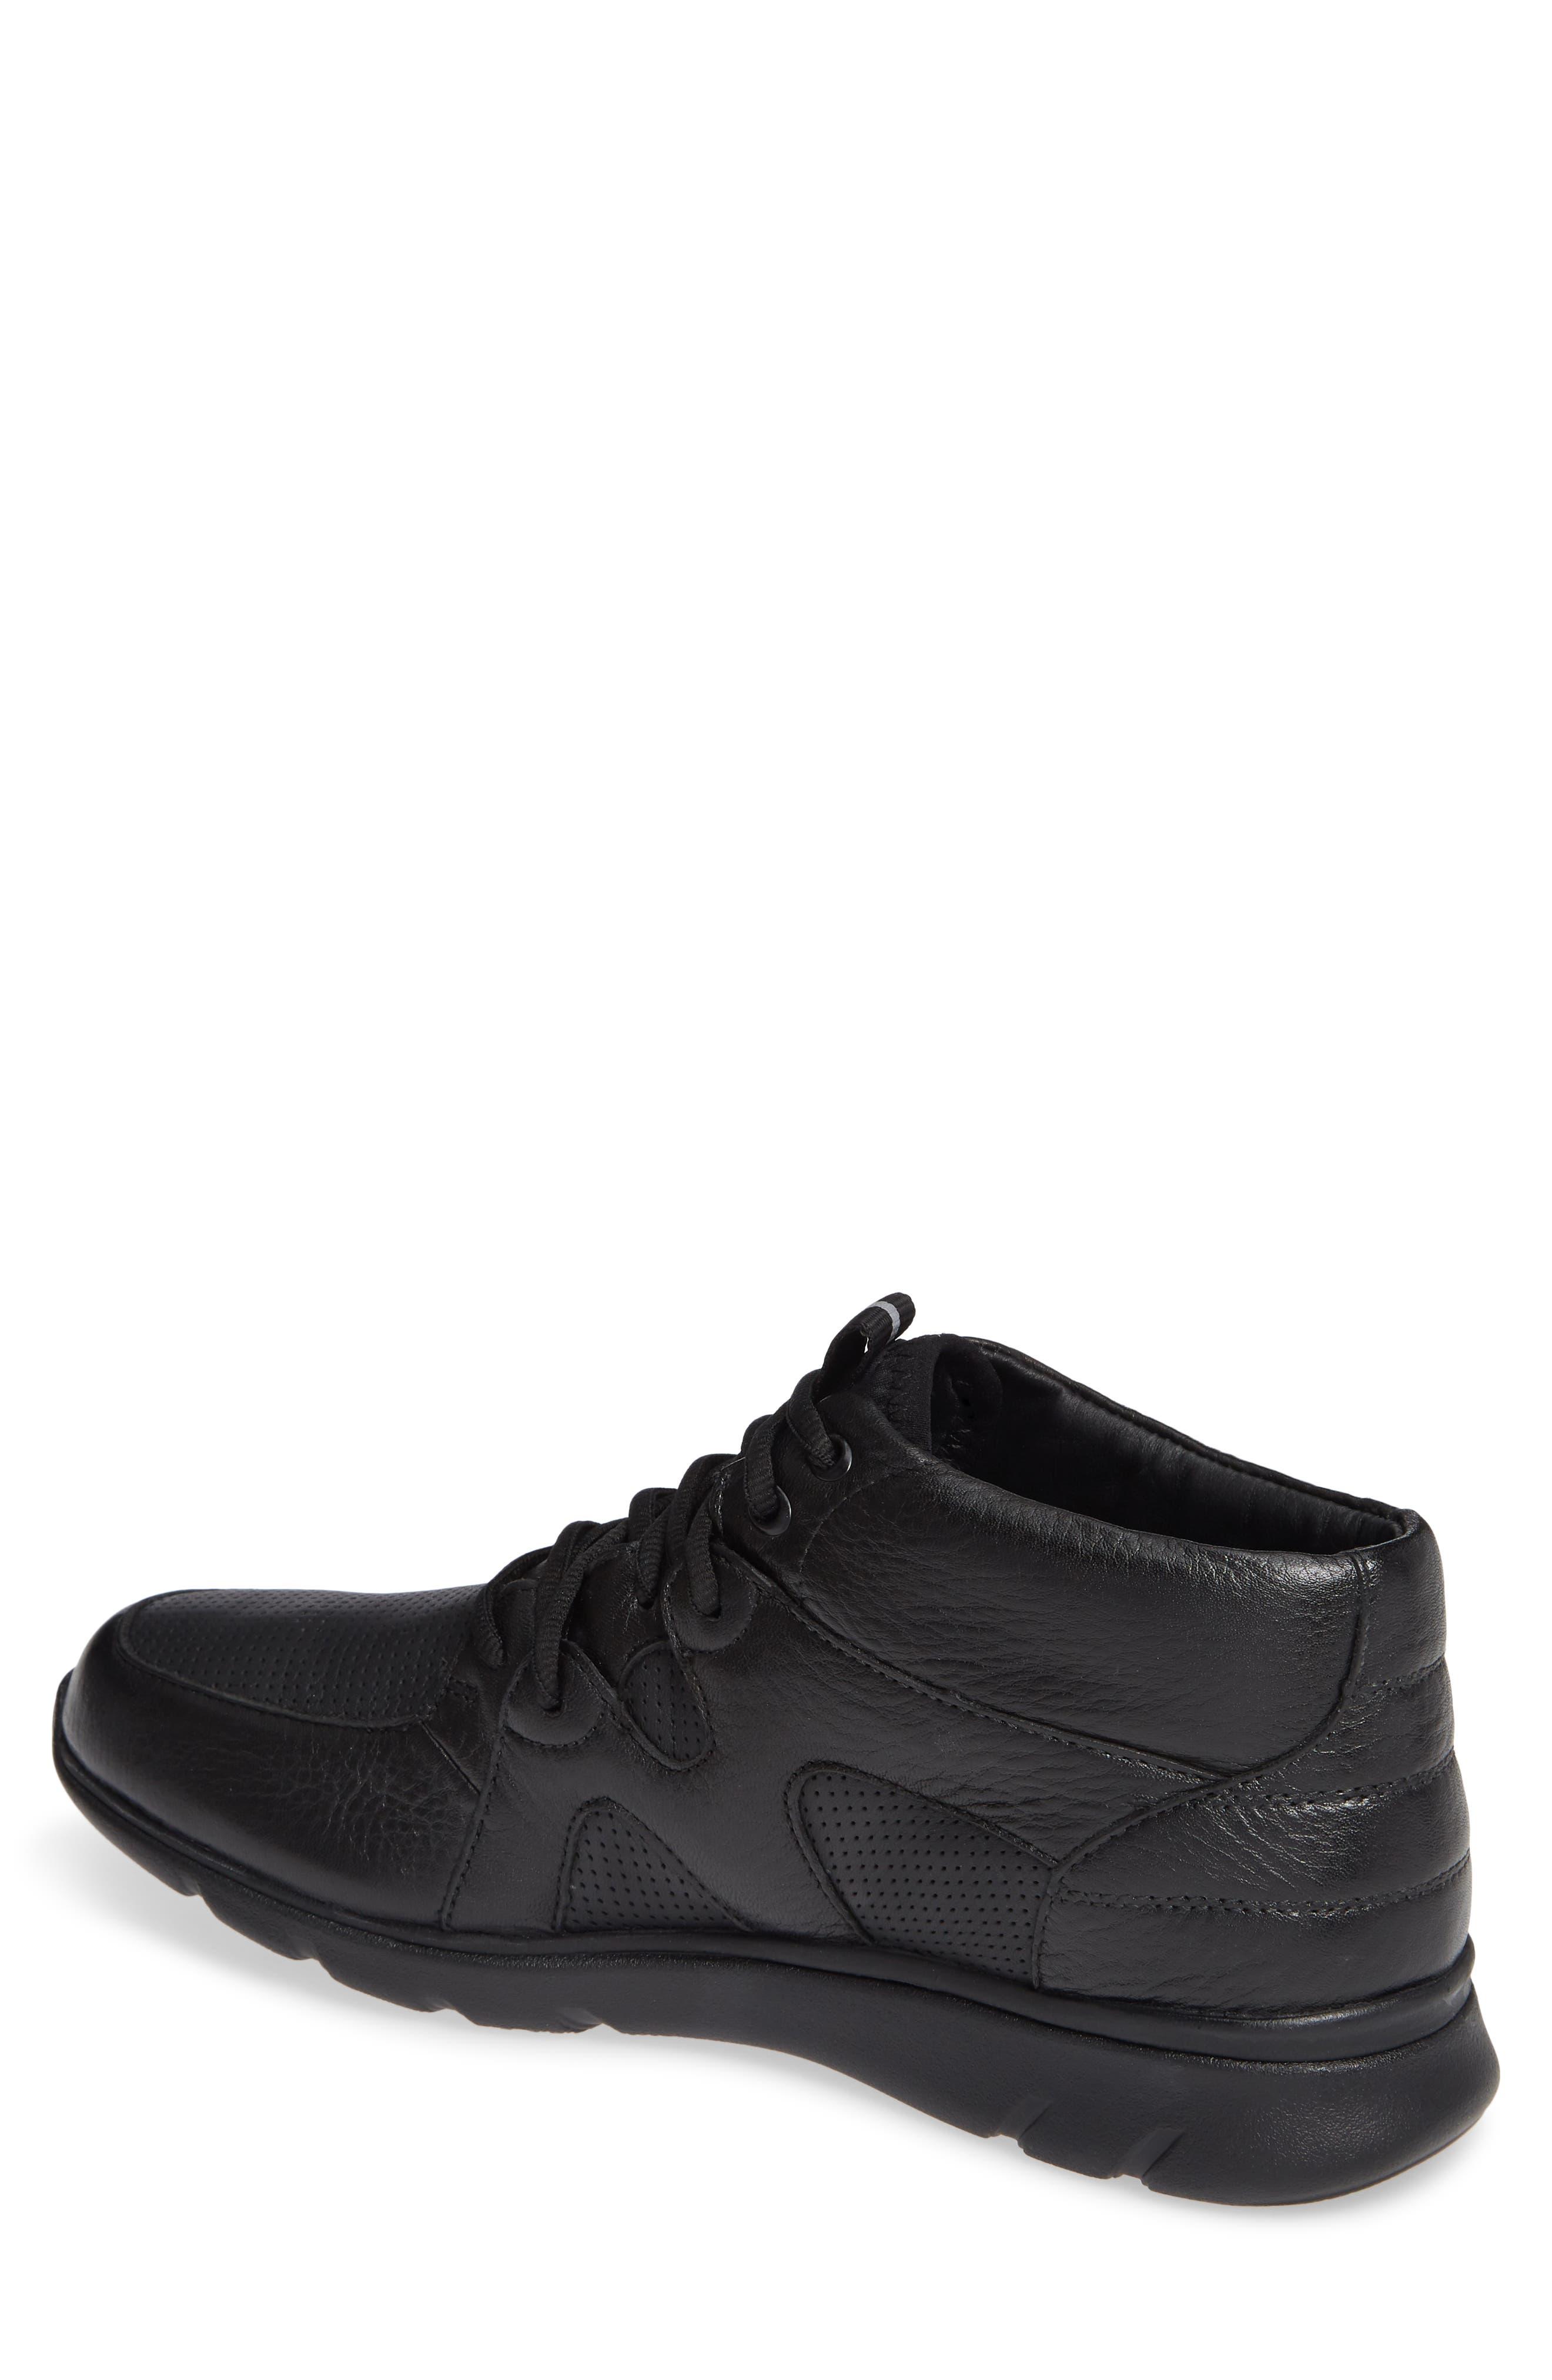 JOHNSTON & MURPHY, Prentiss Waterproof Sneaker, Alternate thumbnail 2, color, BLACK LEATHER